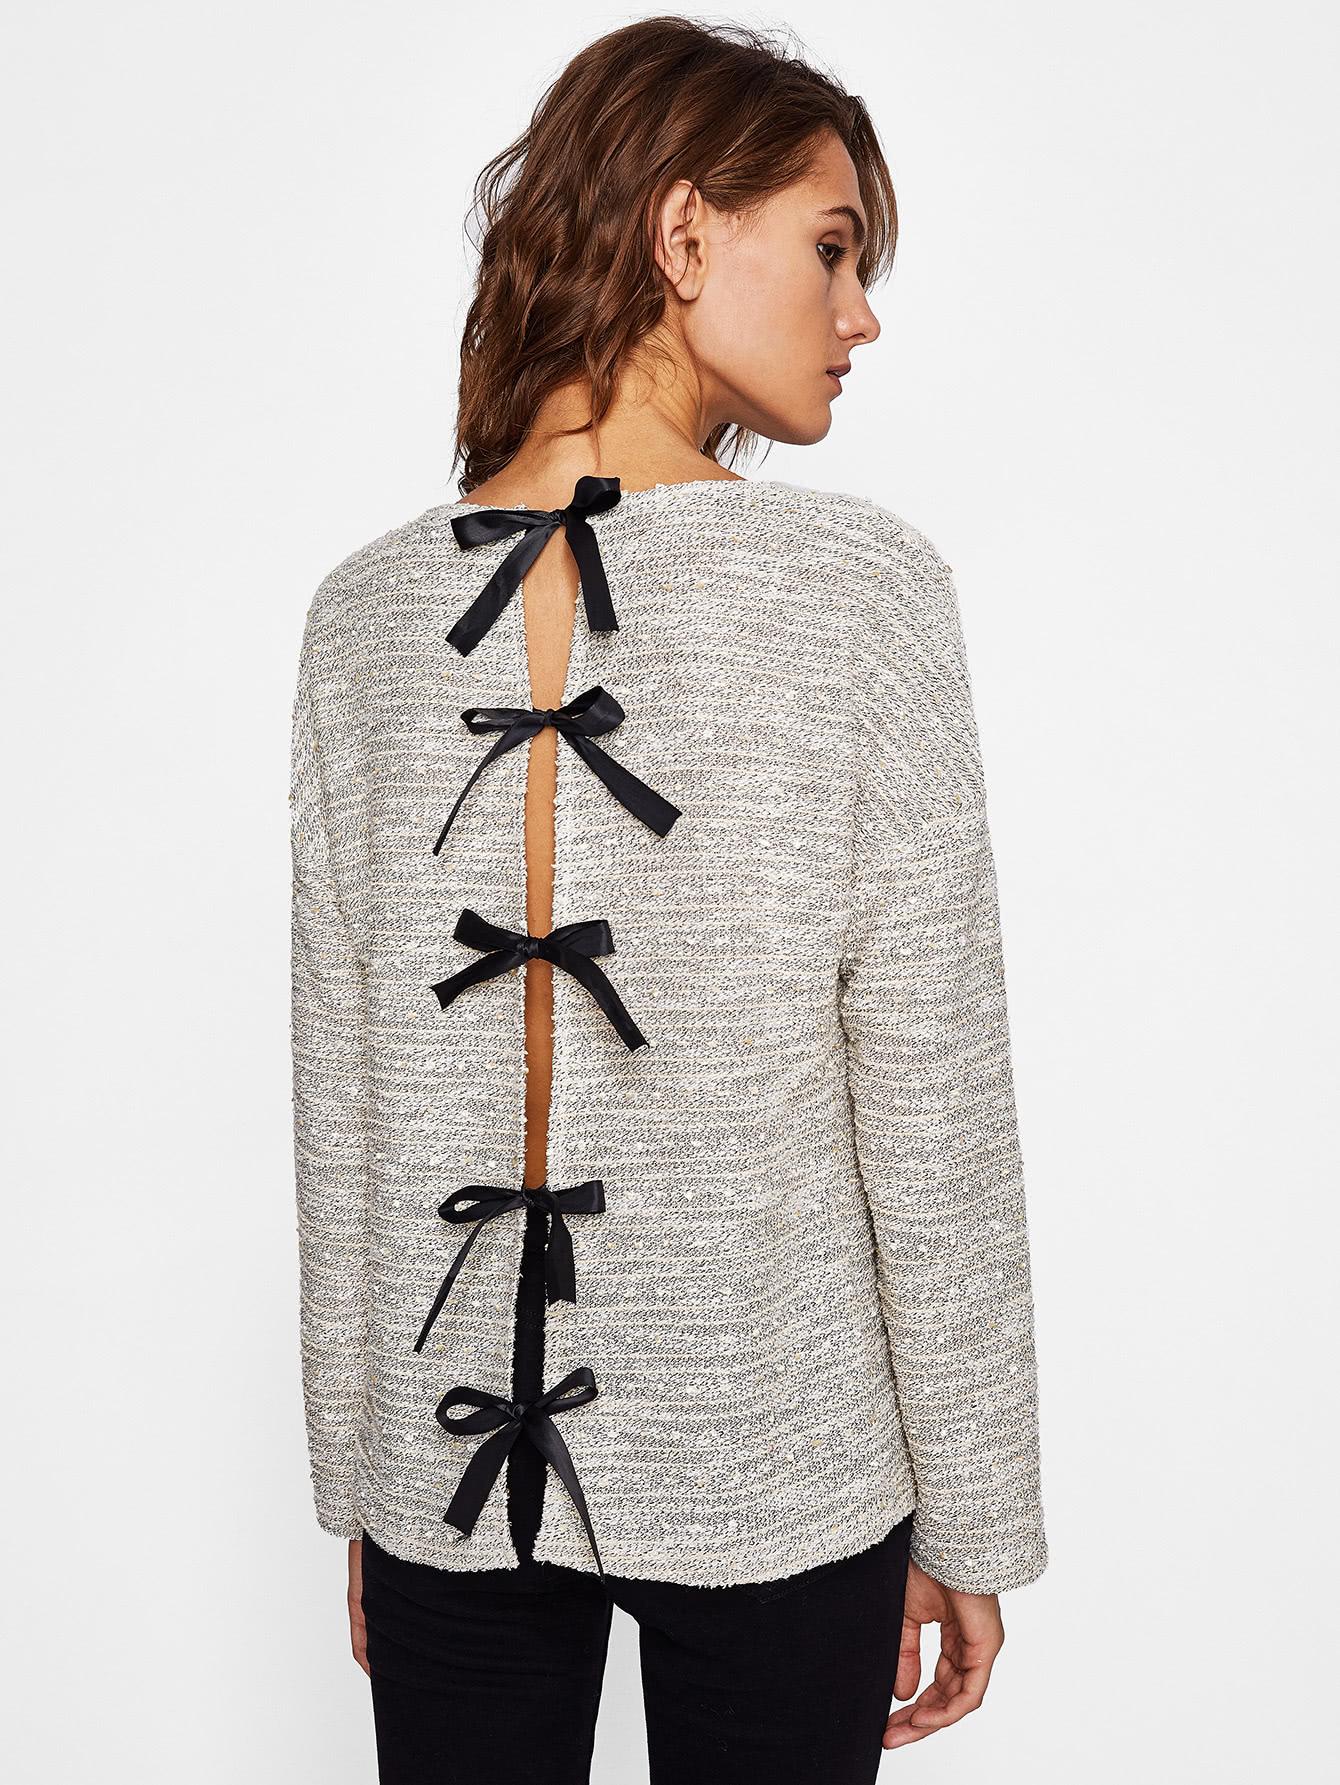 Slit Bow Back Knit Top